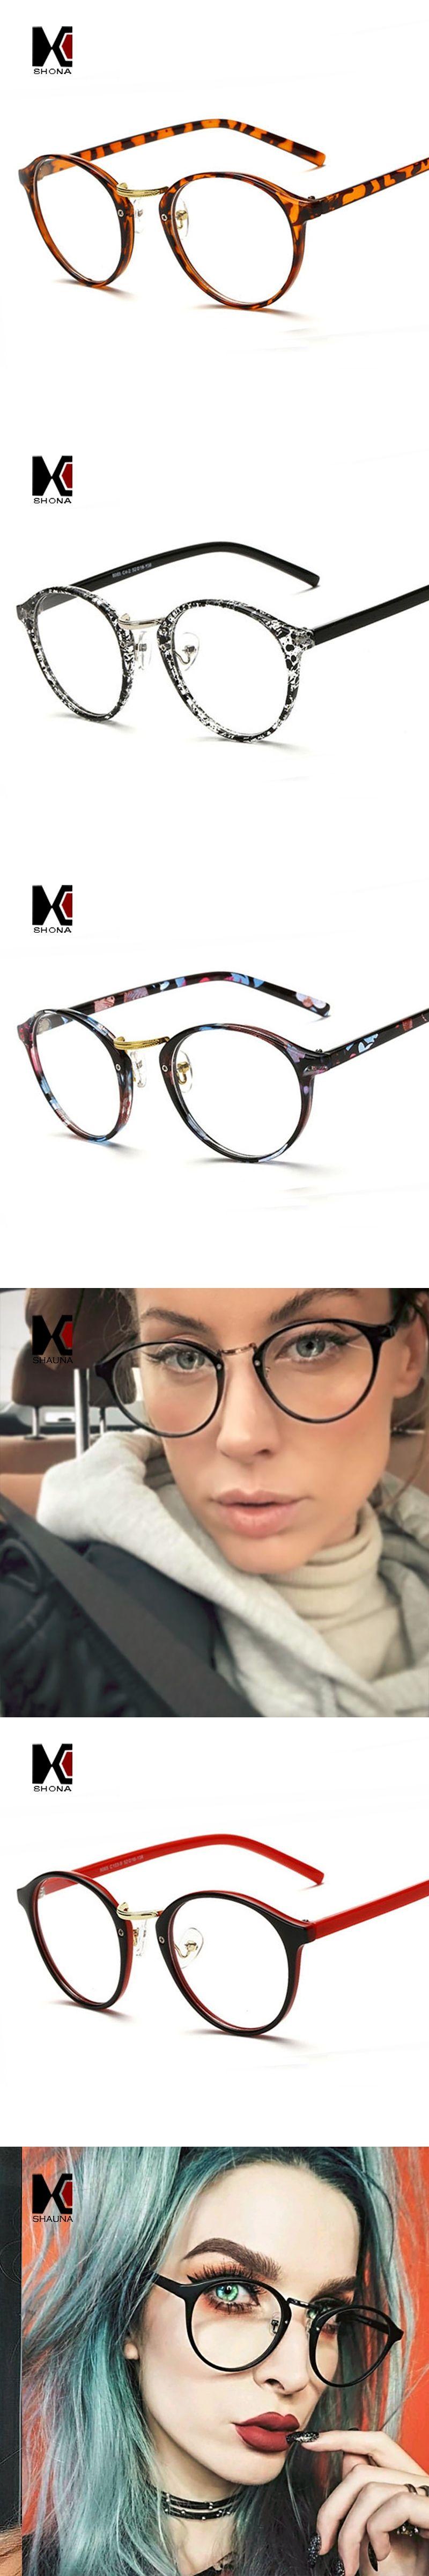 b07e9bc28f2 SHAUNA Fashion Round Eyeglasses Frames Brand Designer Men Black Circling  Optical Frame Glasses Women Eyewear Plain